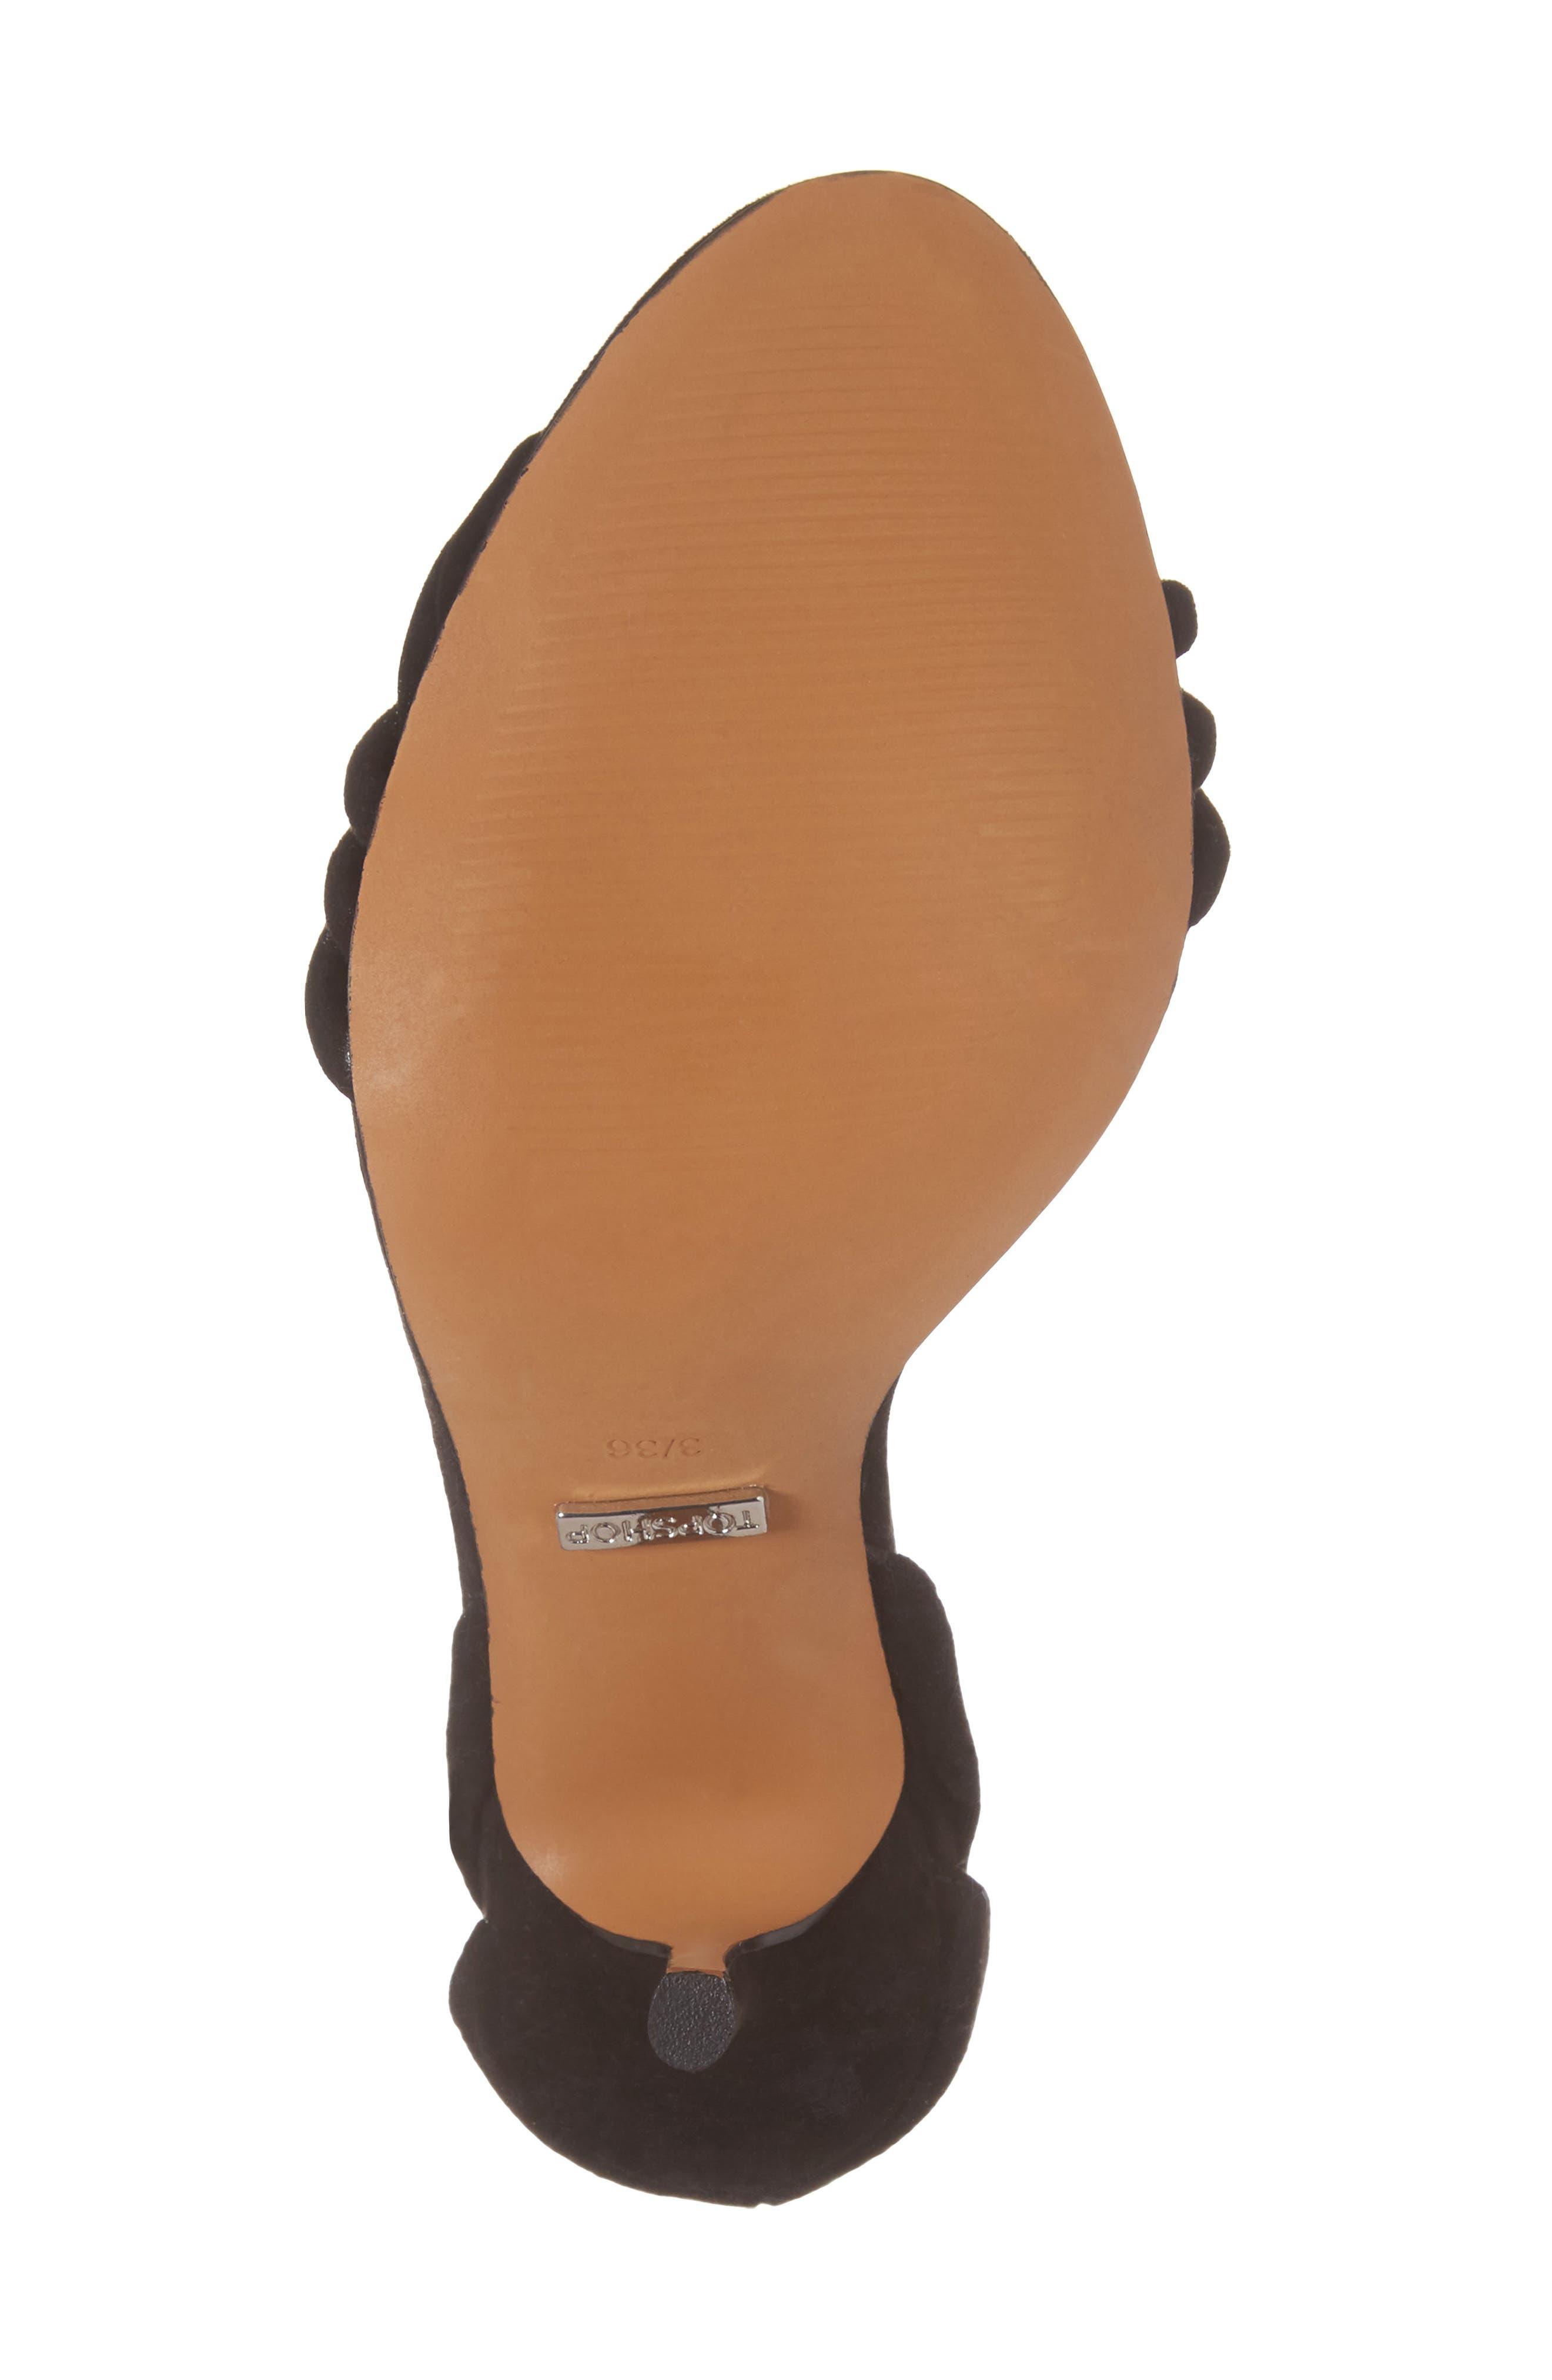 TOPSHOP, Ramona Ankle Wrap Sandal, Alternate thumbnail 6, color, 001